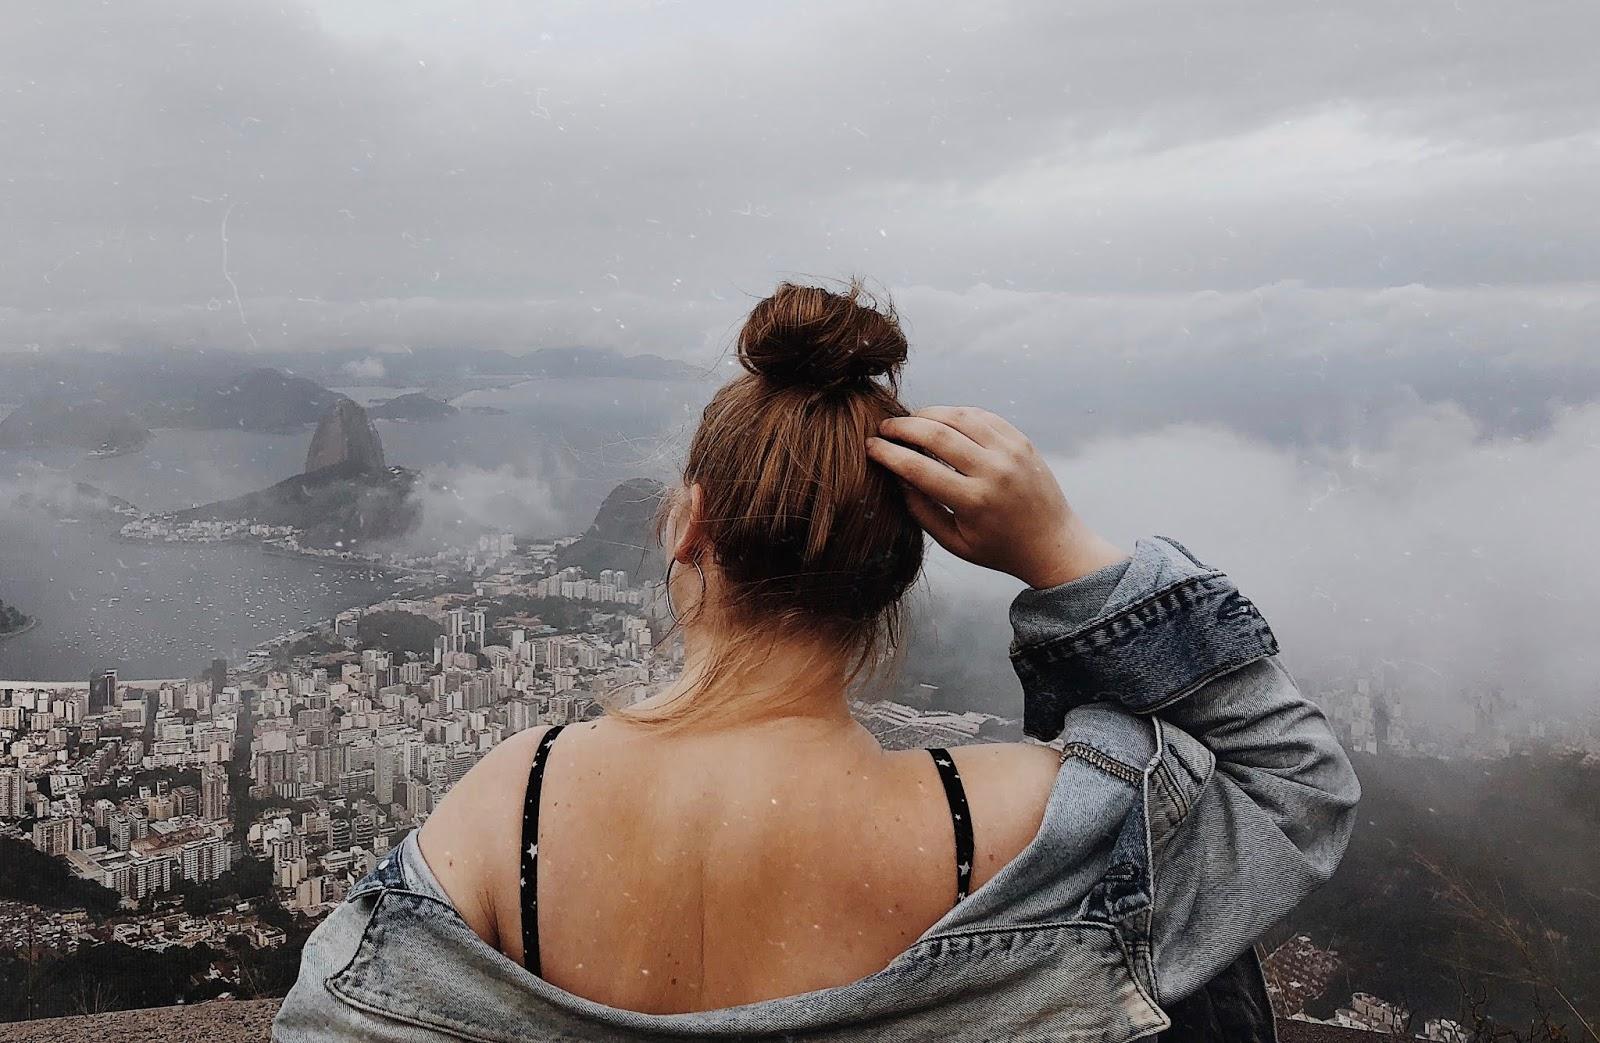 Video: 5 Days in Rio